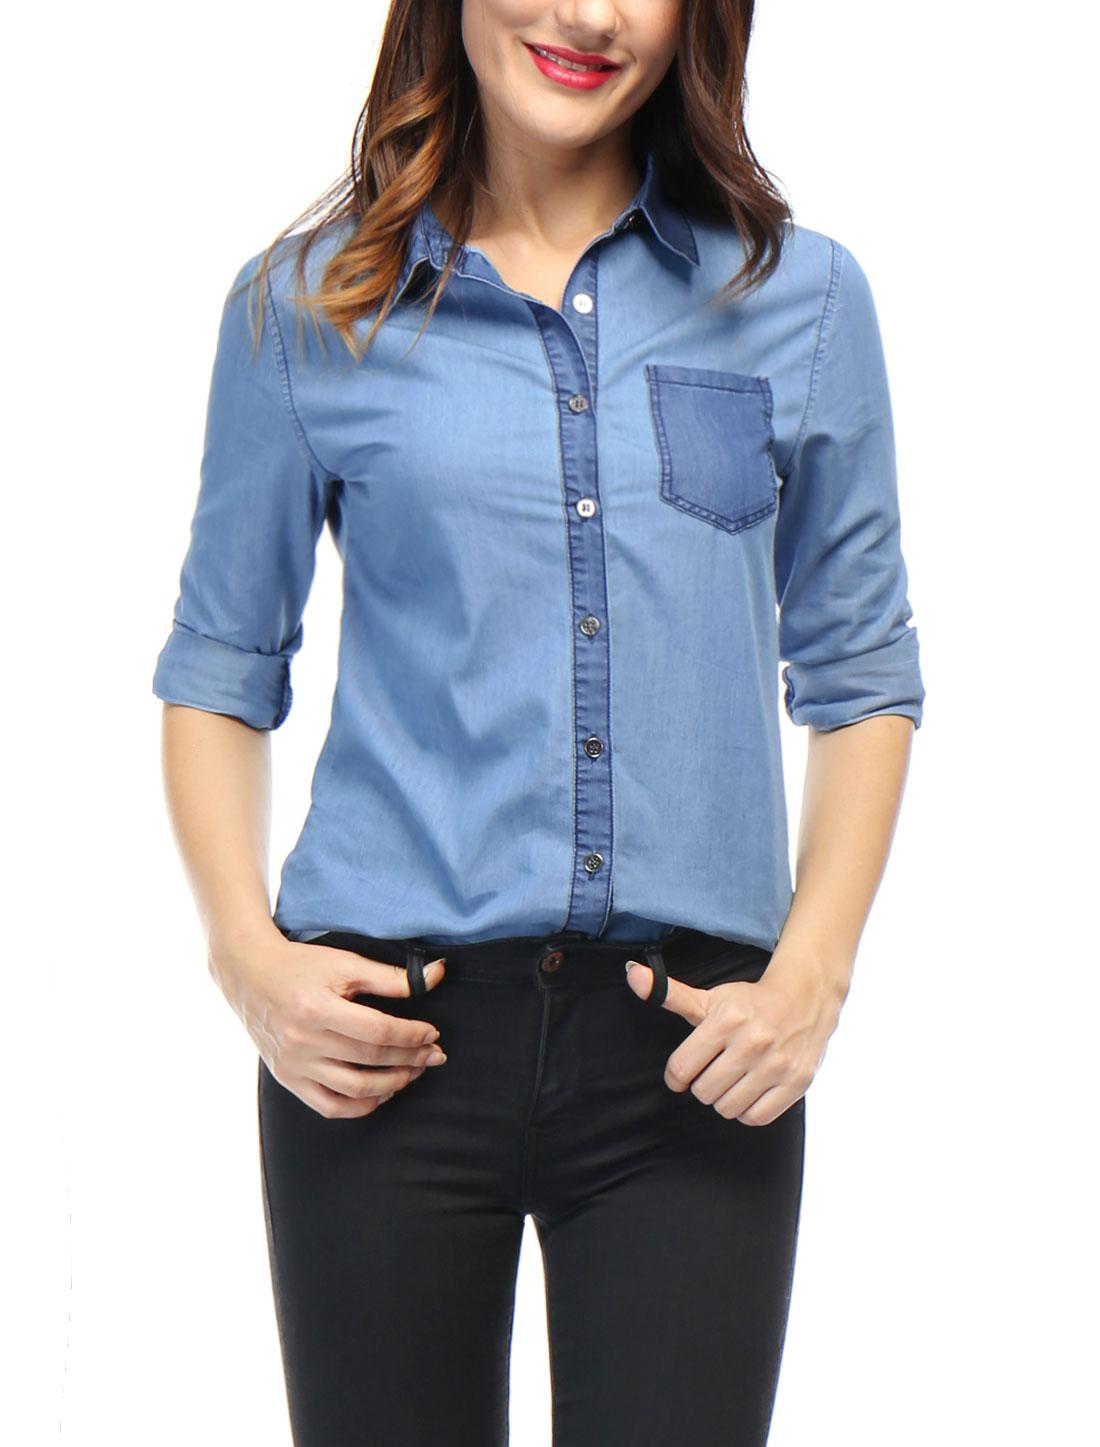 Women Color Block Long Sleeves Button Down Shirt Blue XS